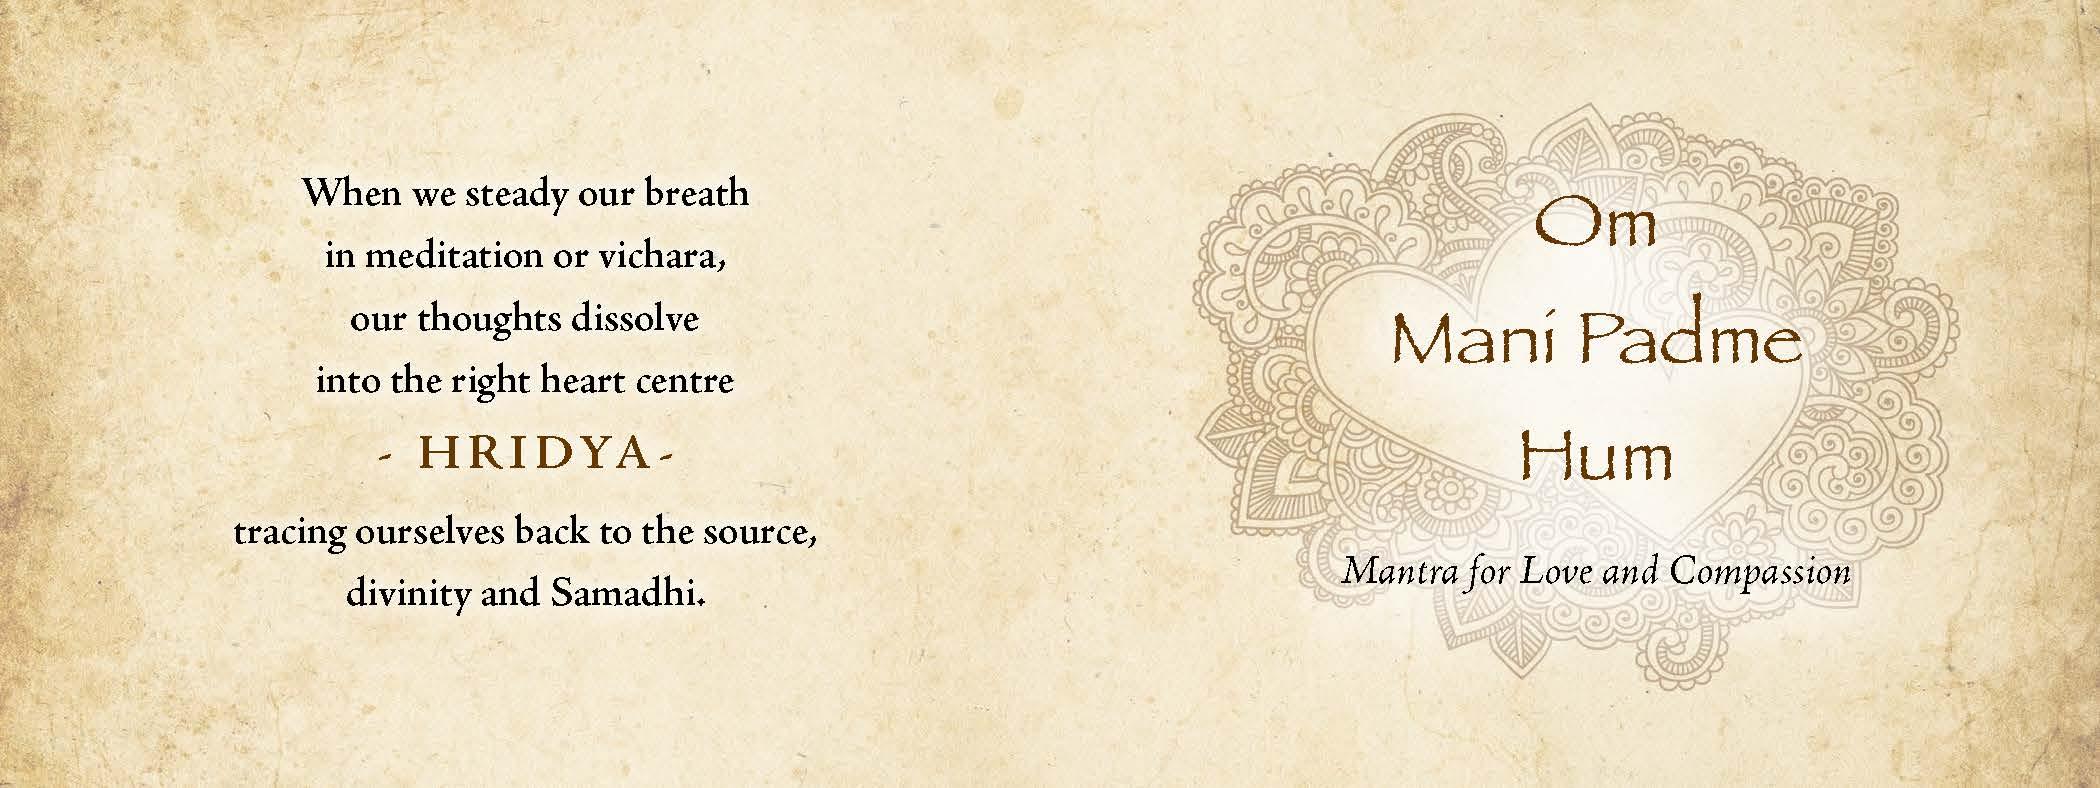 Vyana heart book2 (1)_Page_8.jpg